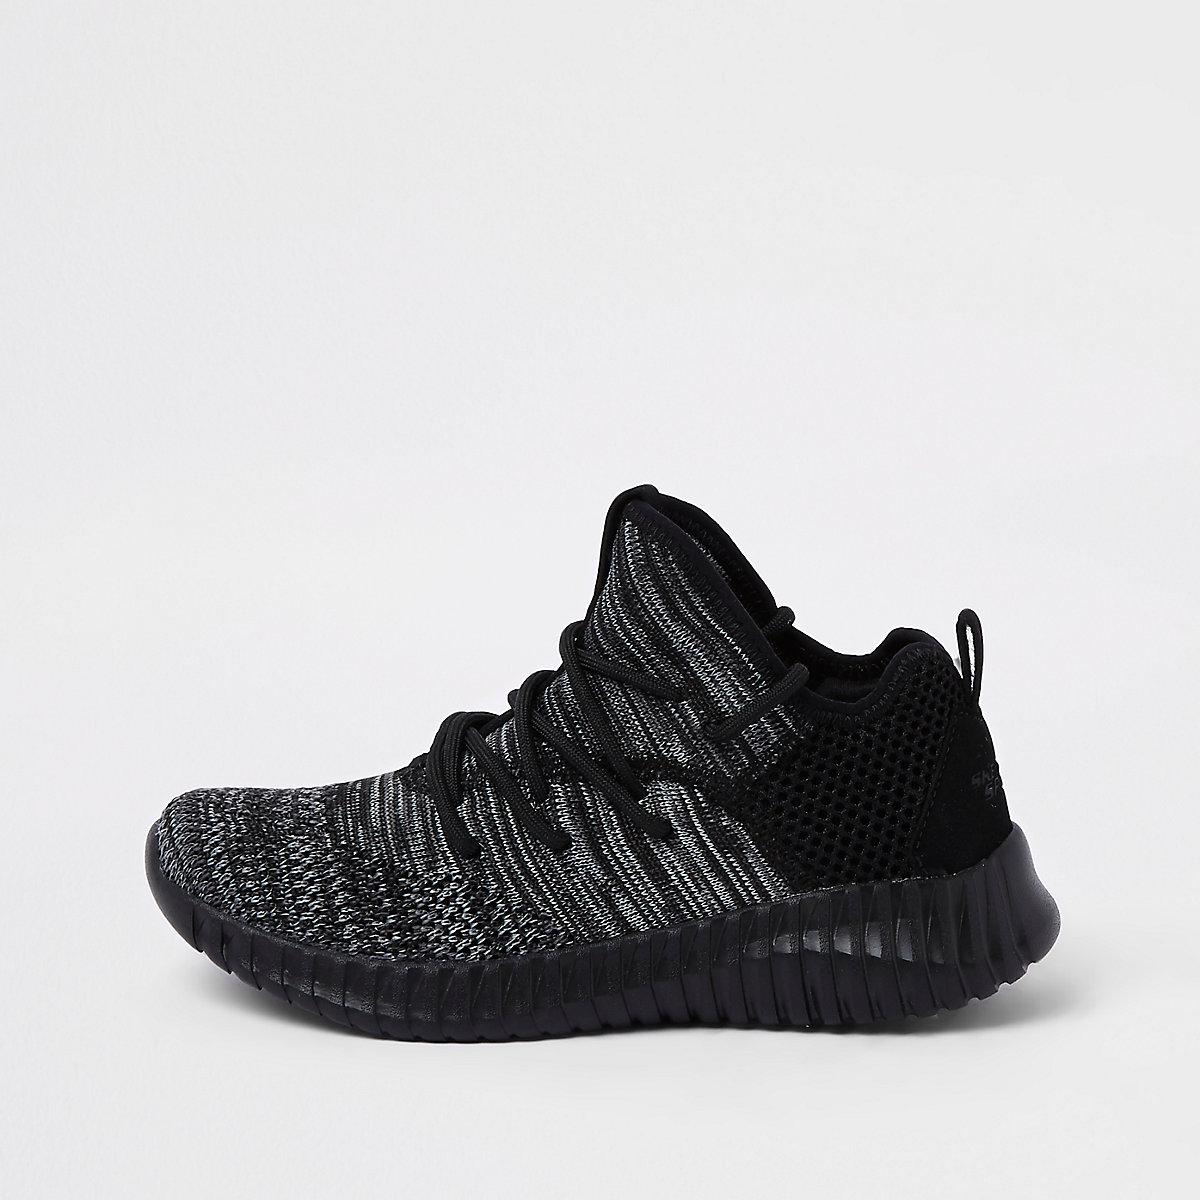 Boys Skechers black mesh runner sneakers